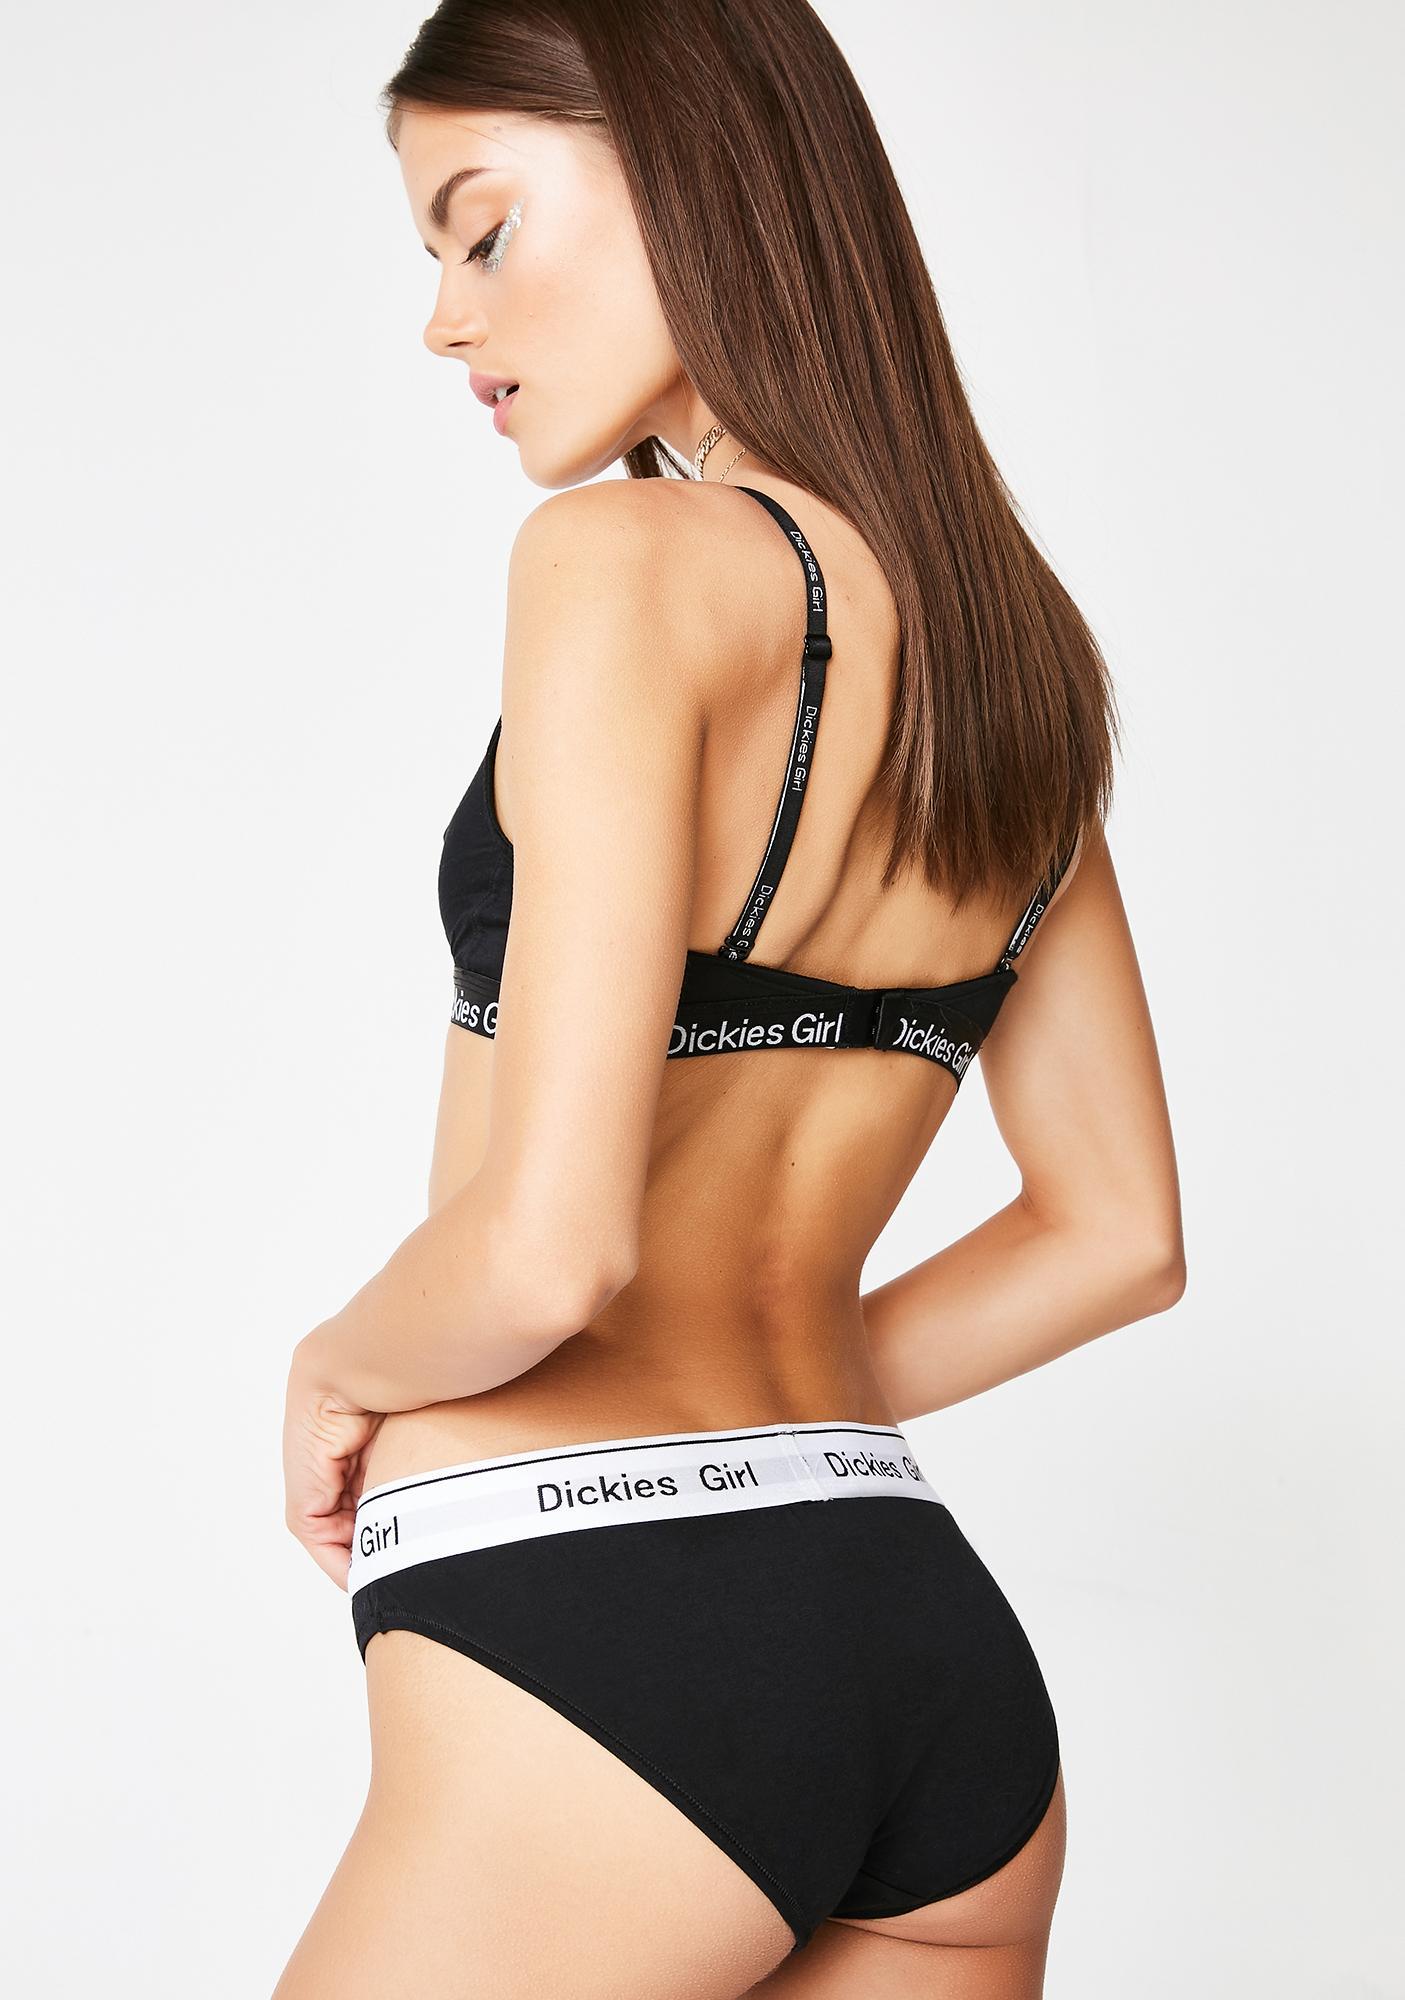 98cdb82497 ... Dickies Girl Wicked Bikini Briefs 3-Pack